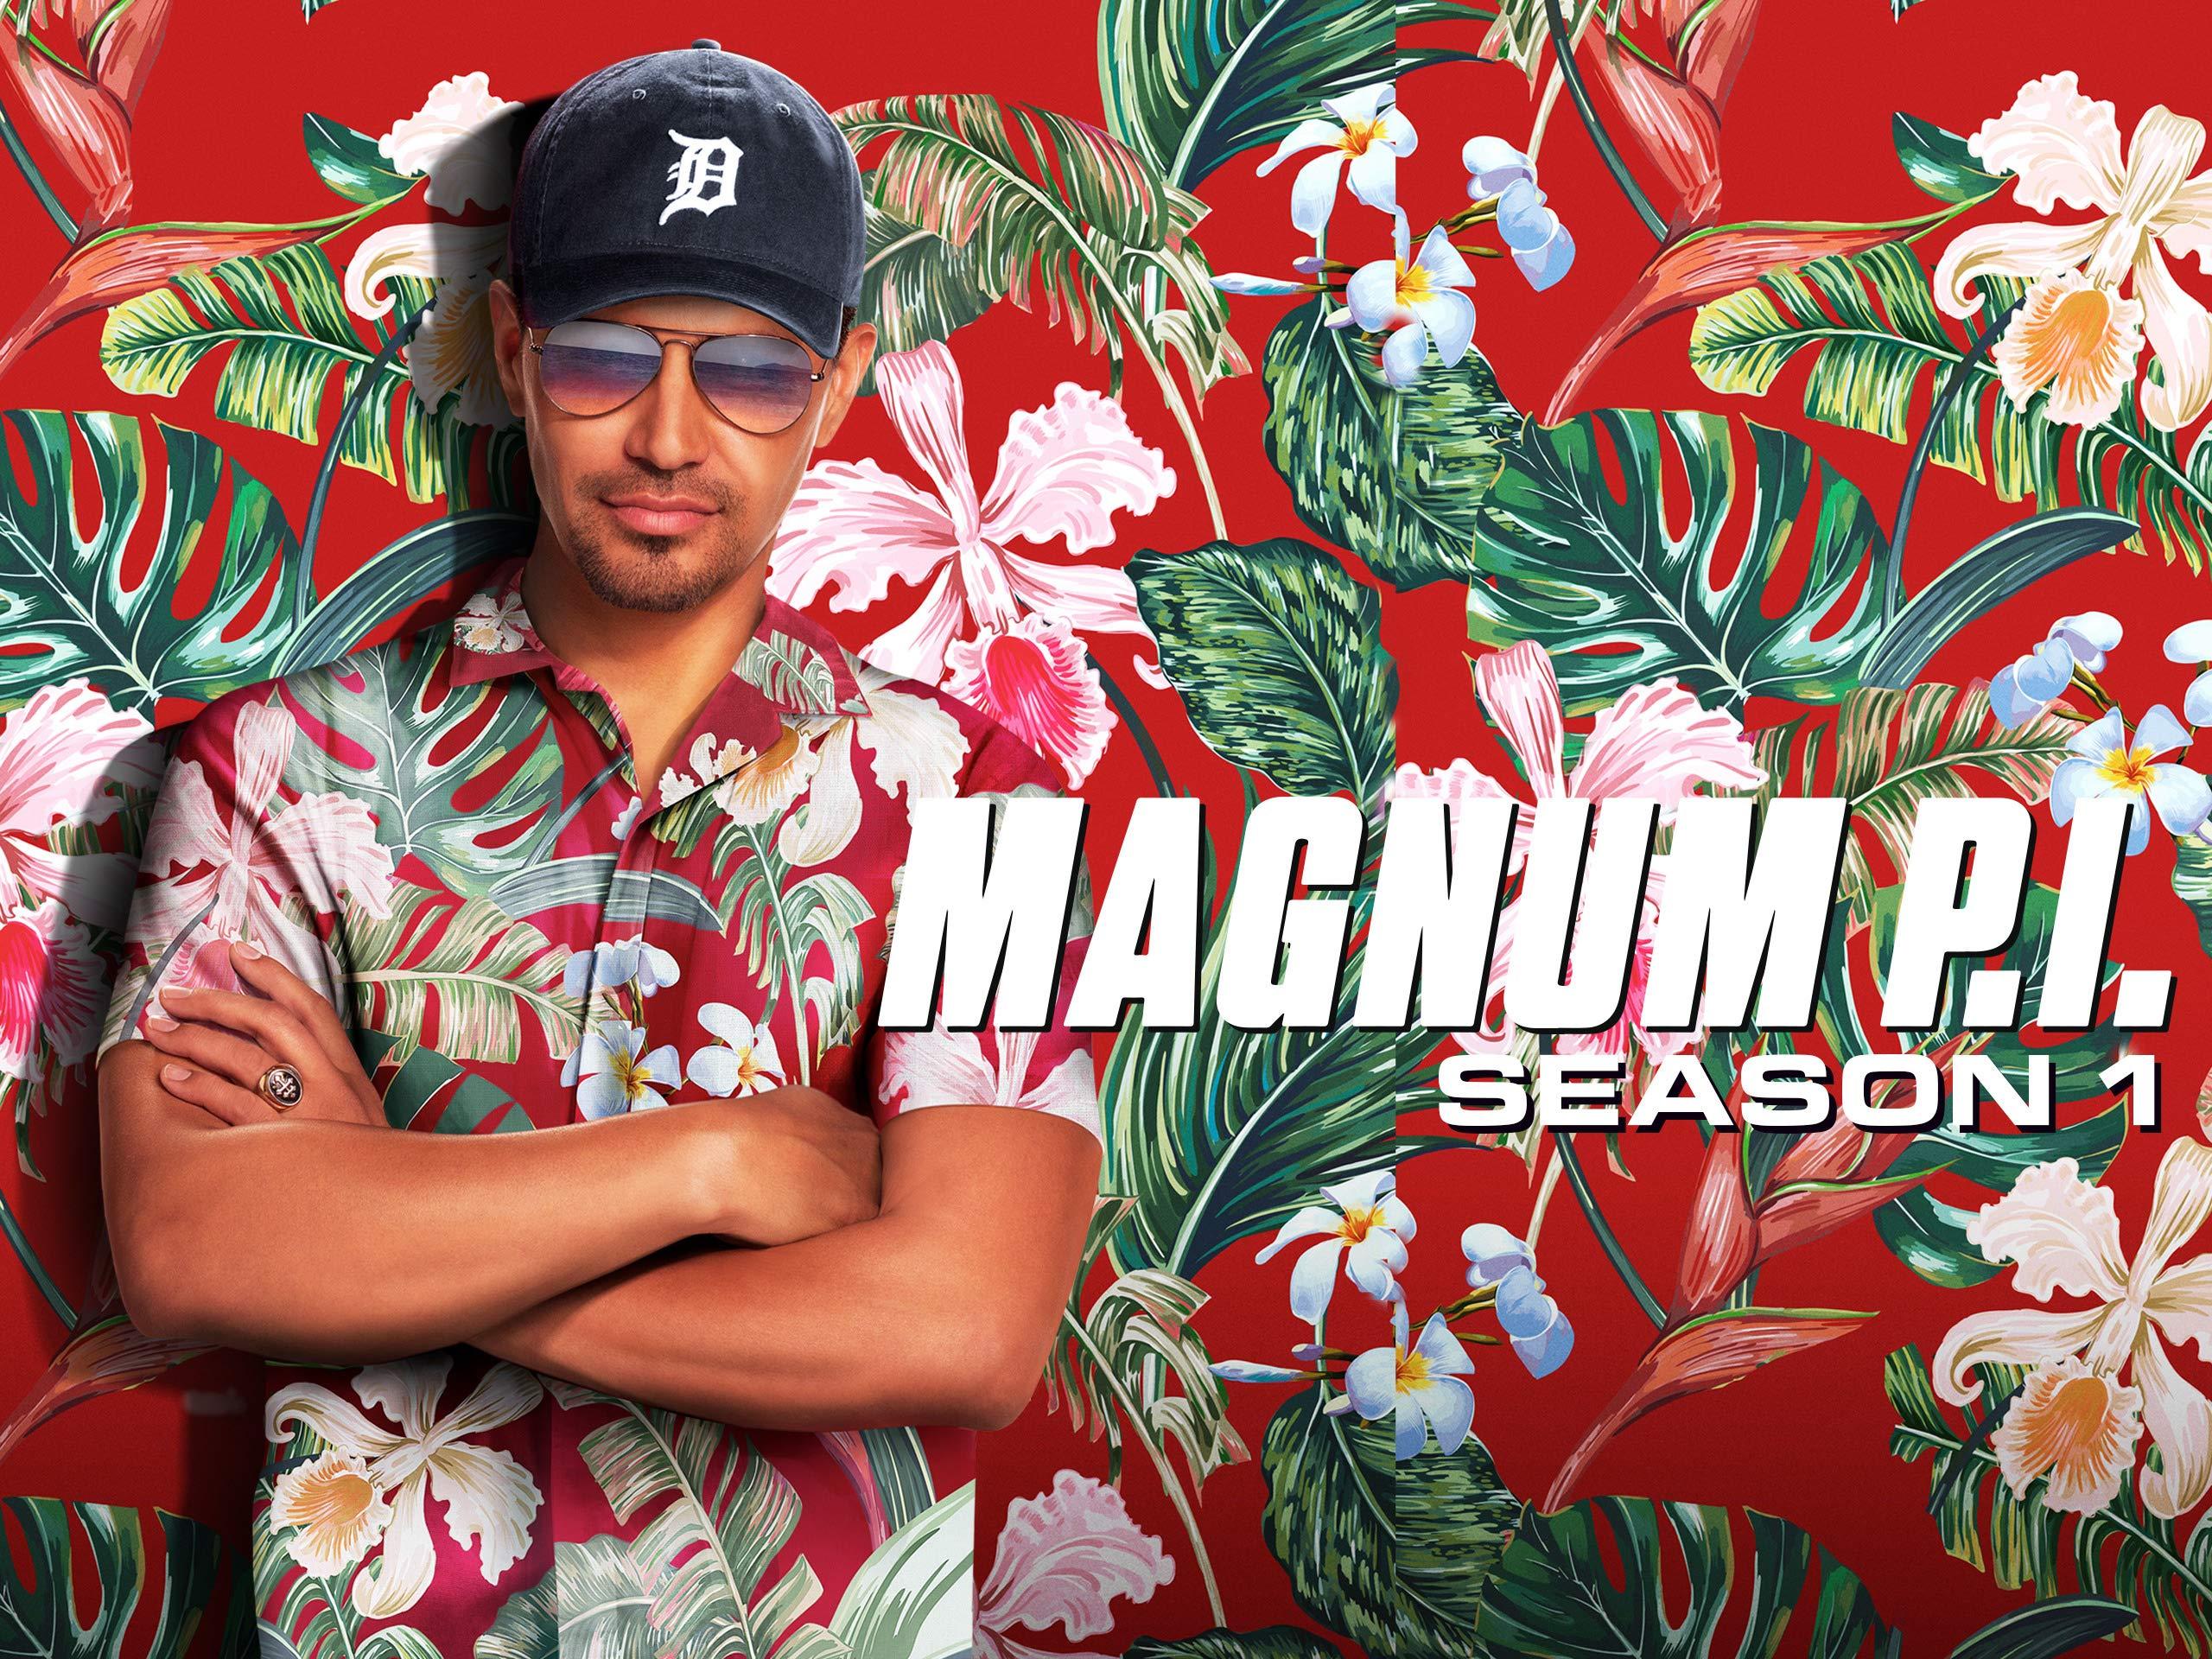 Amazon.de: Magnum P.I. ('18), Season 1 ansehen   Prime Video